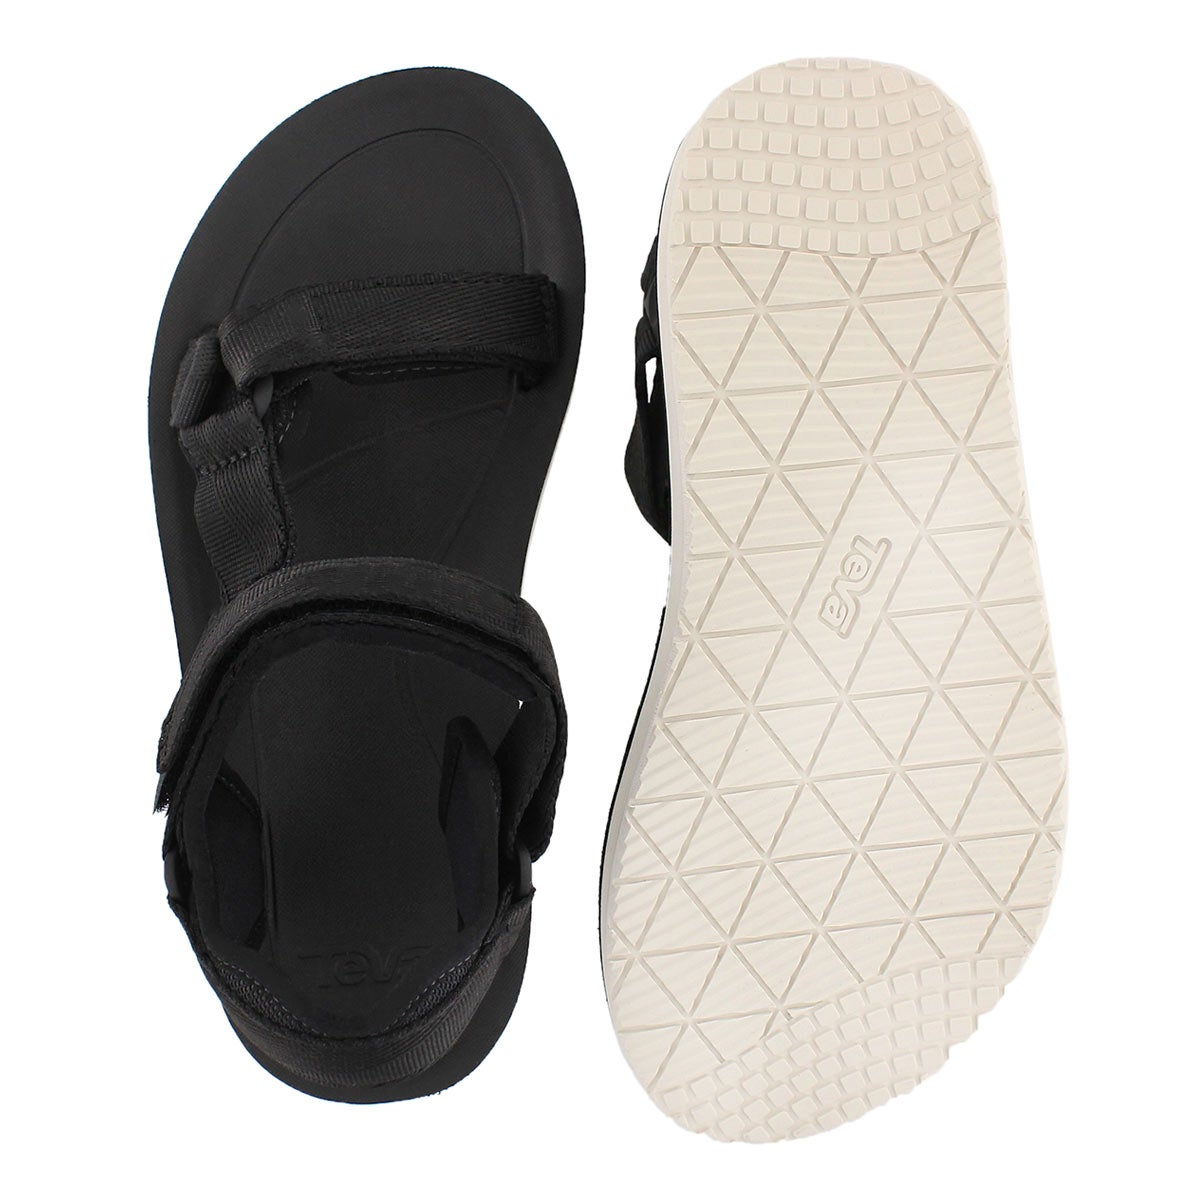 Lds Orig Universal Premier blk sandal